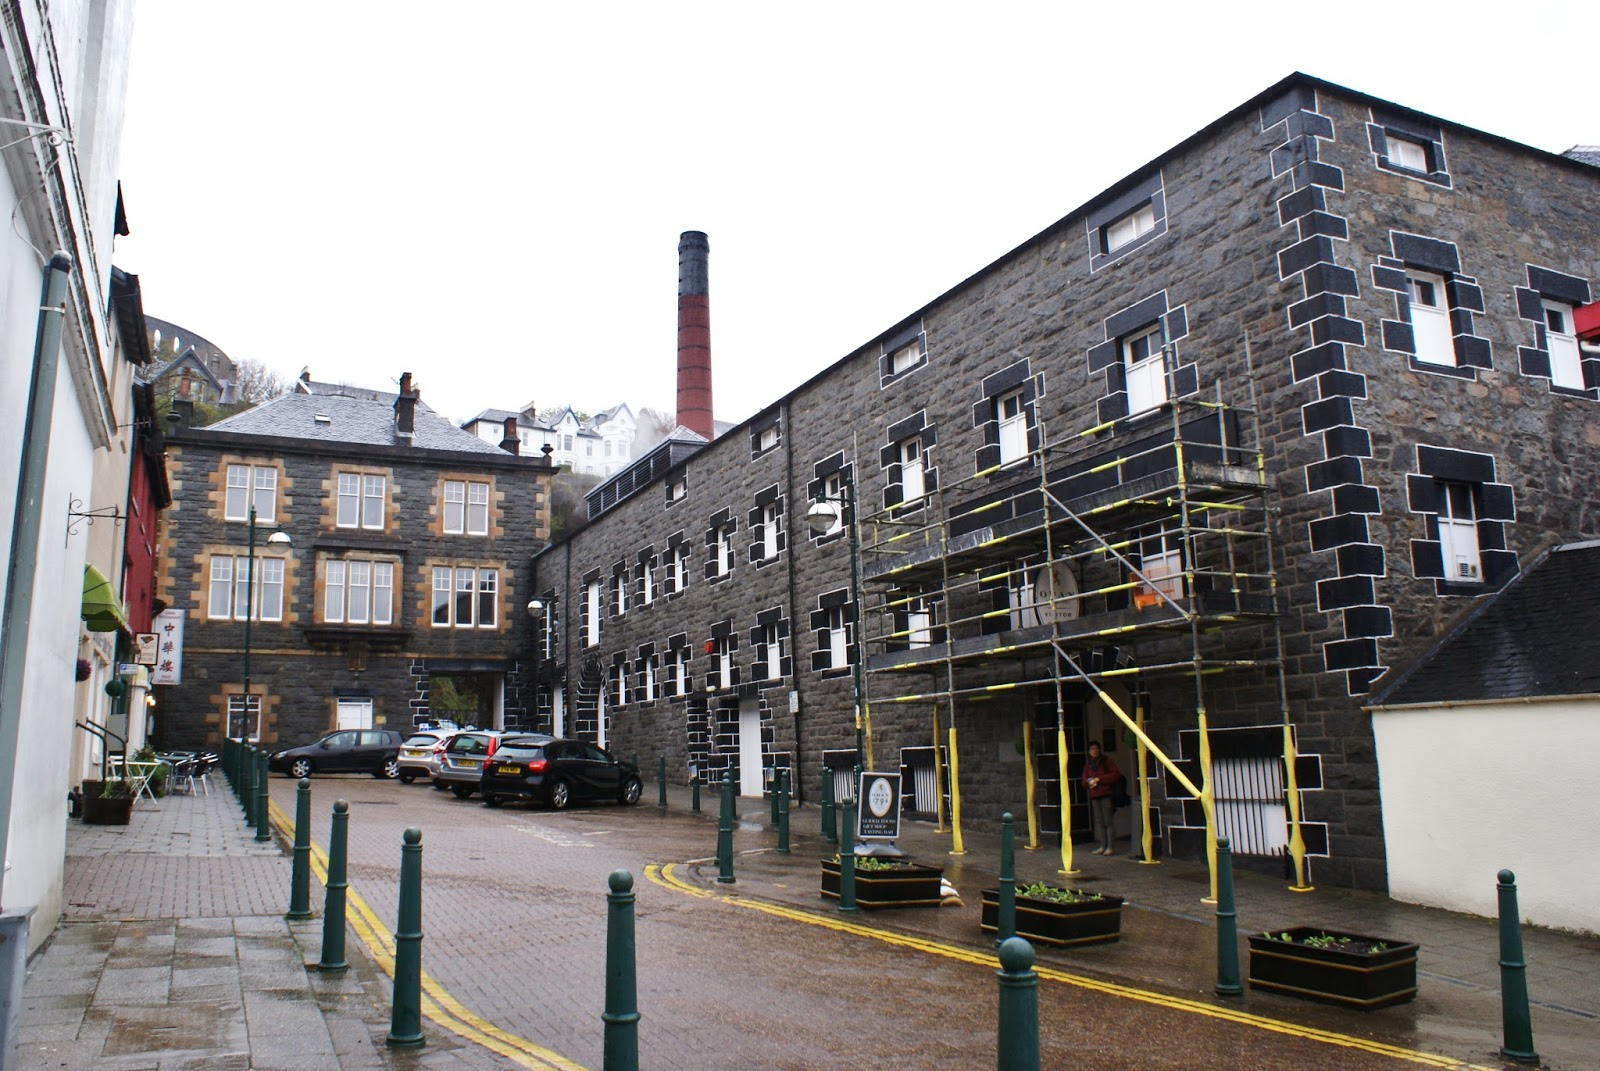 distillery oban argyll highlands scotland uk great britain camomille blend